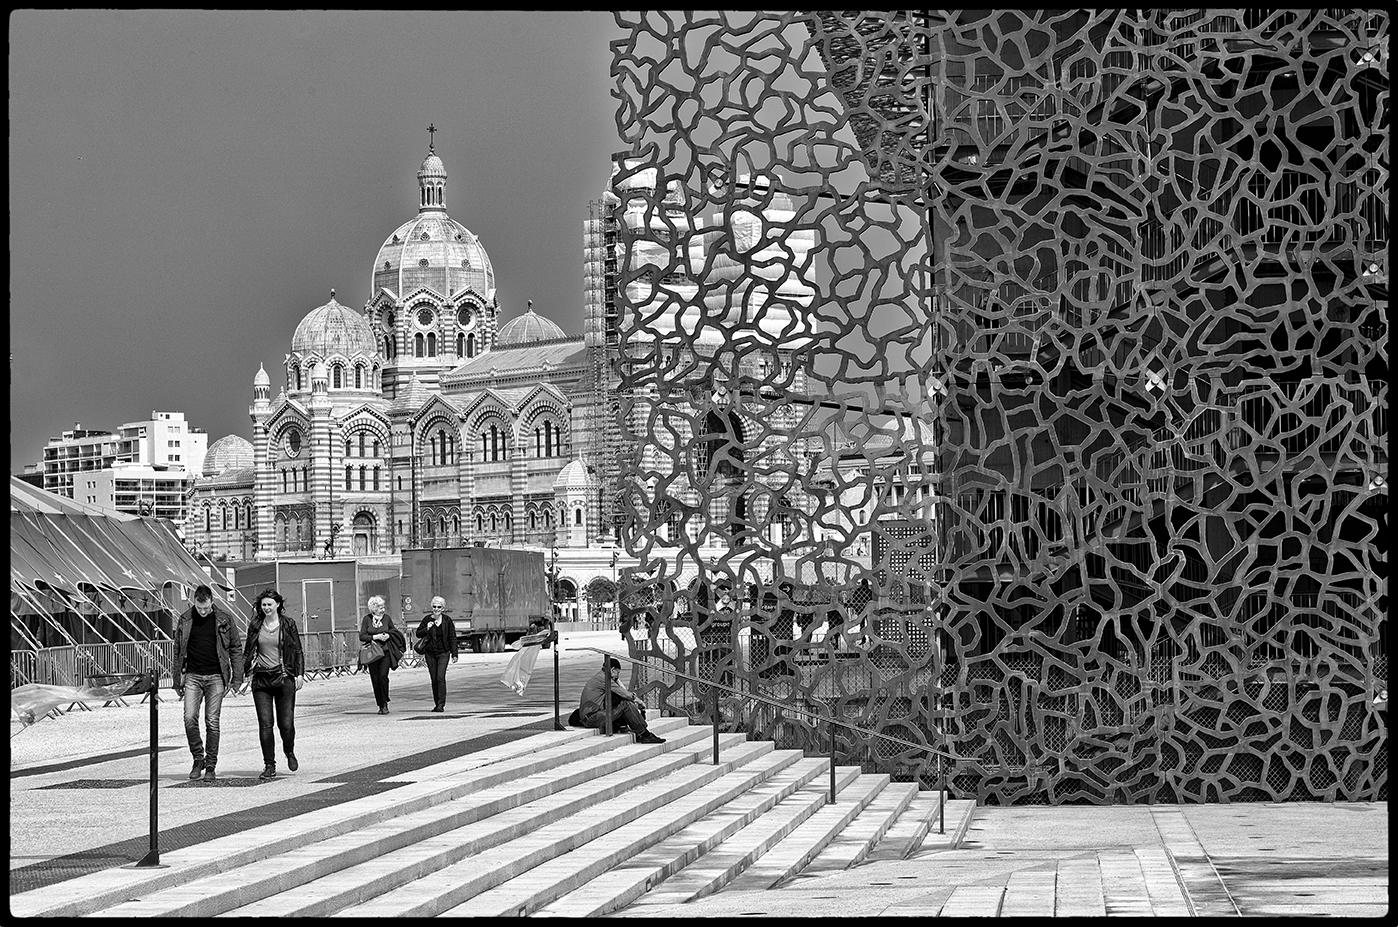 Marseille, Mucem, 04/2016